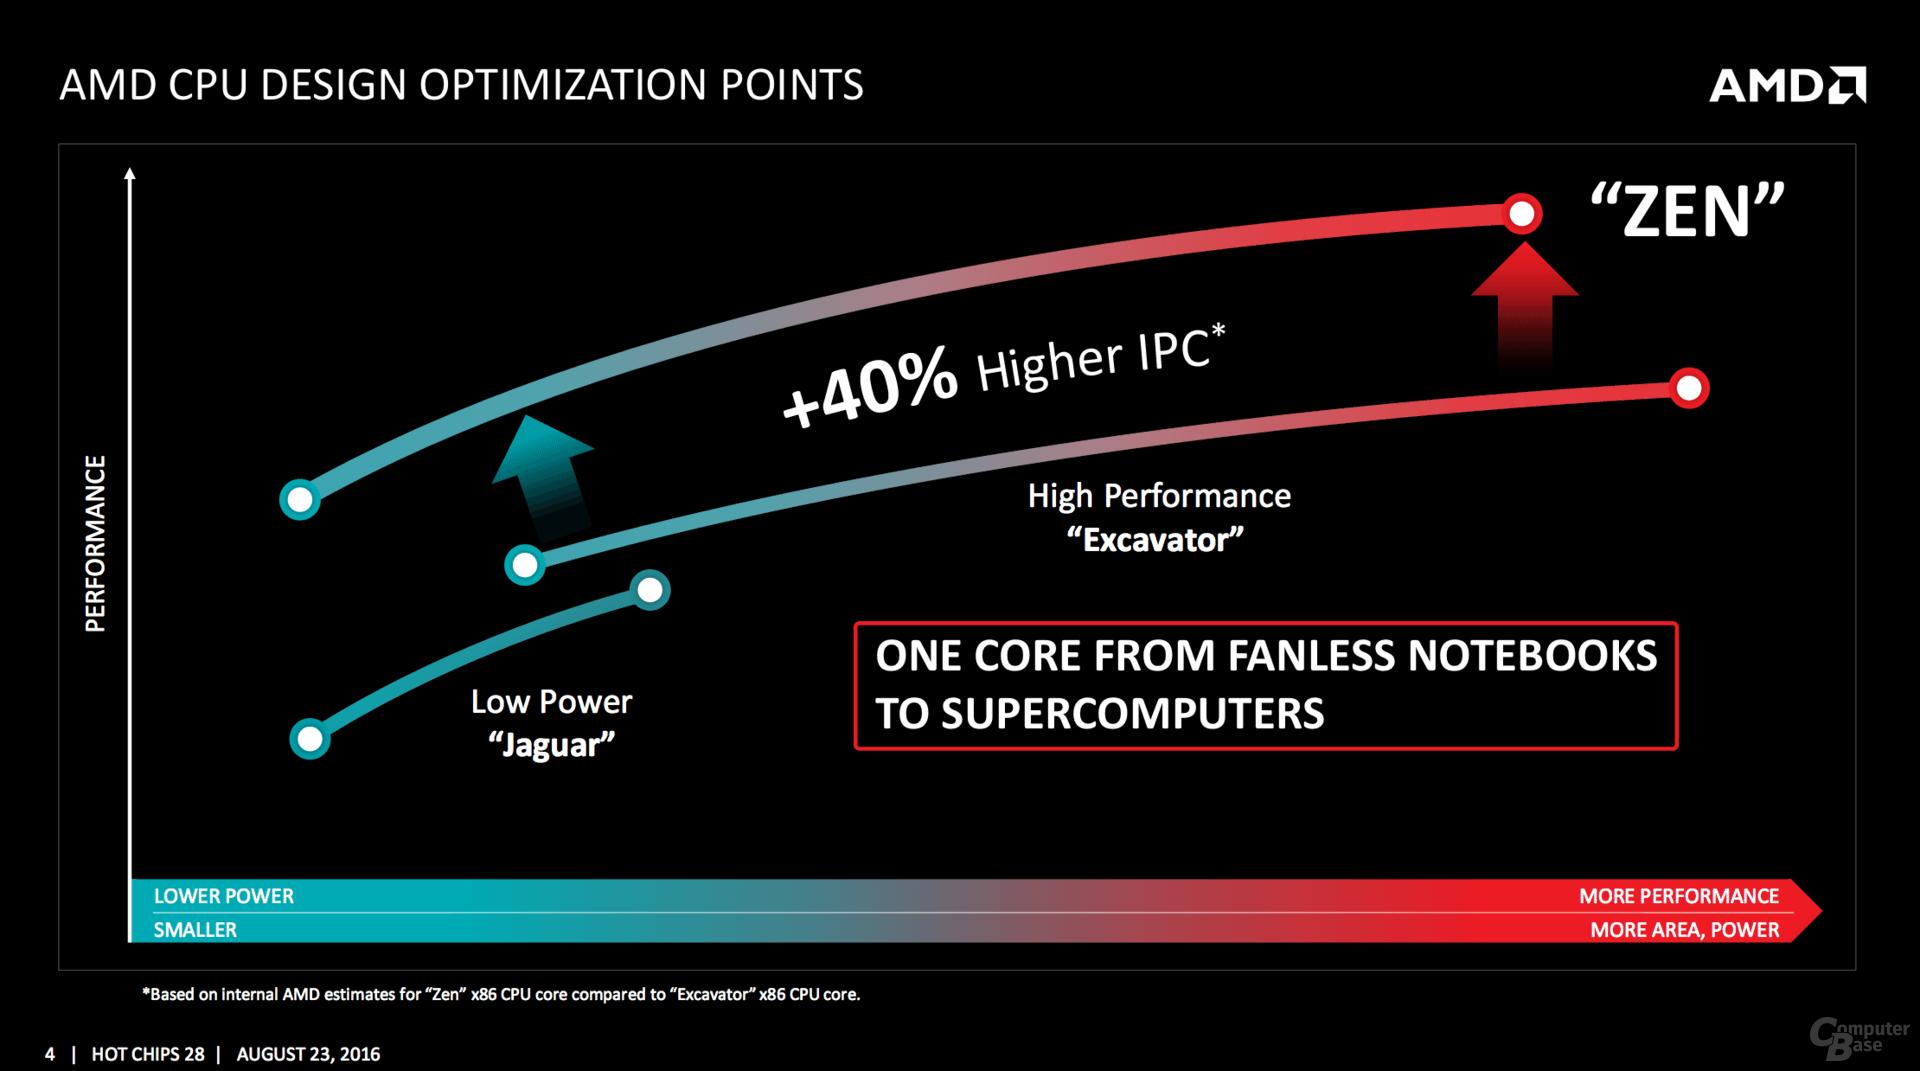 AMD-zen-IPC-power-improvements